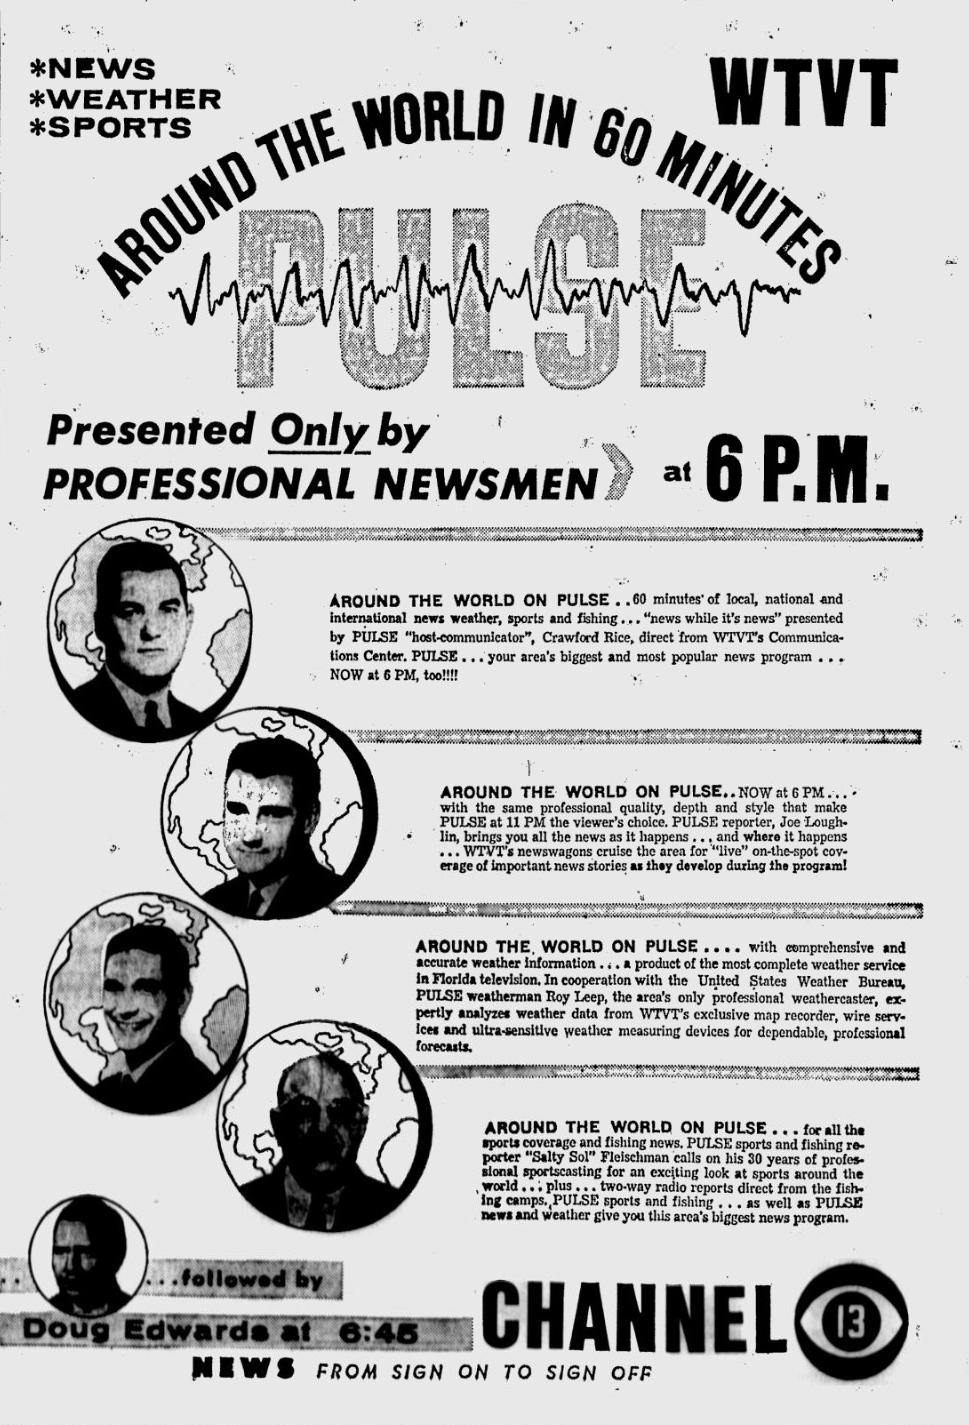 1959-02-16-wtvt-pulse-news